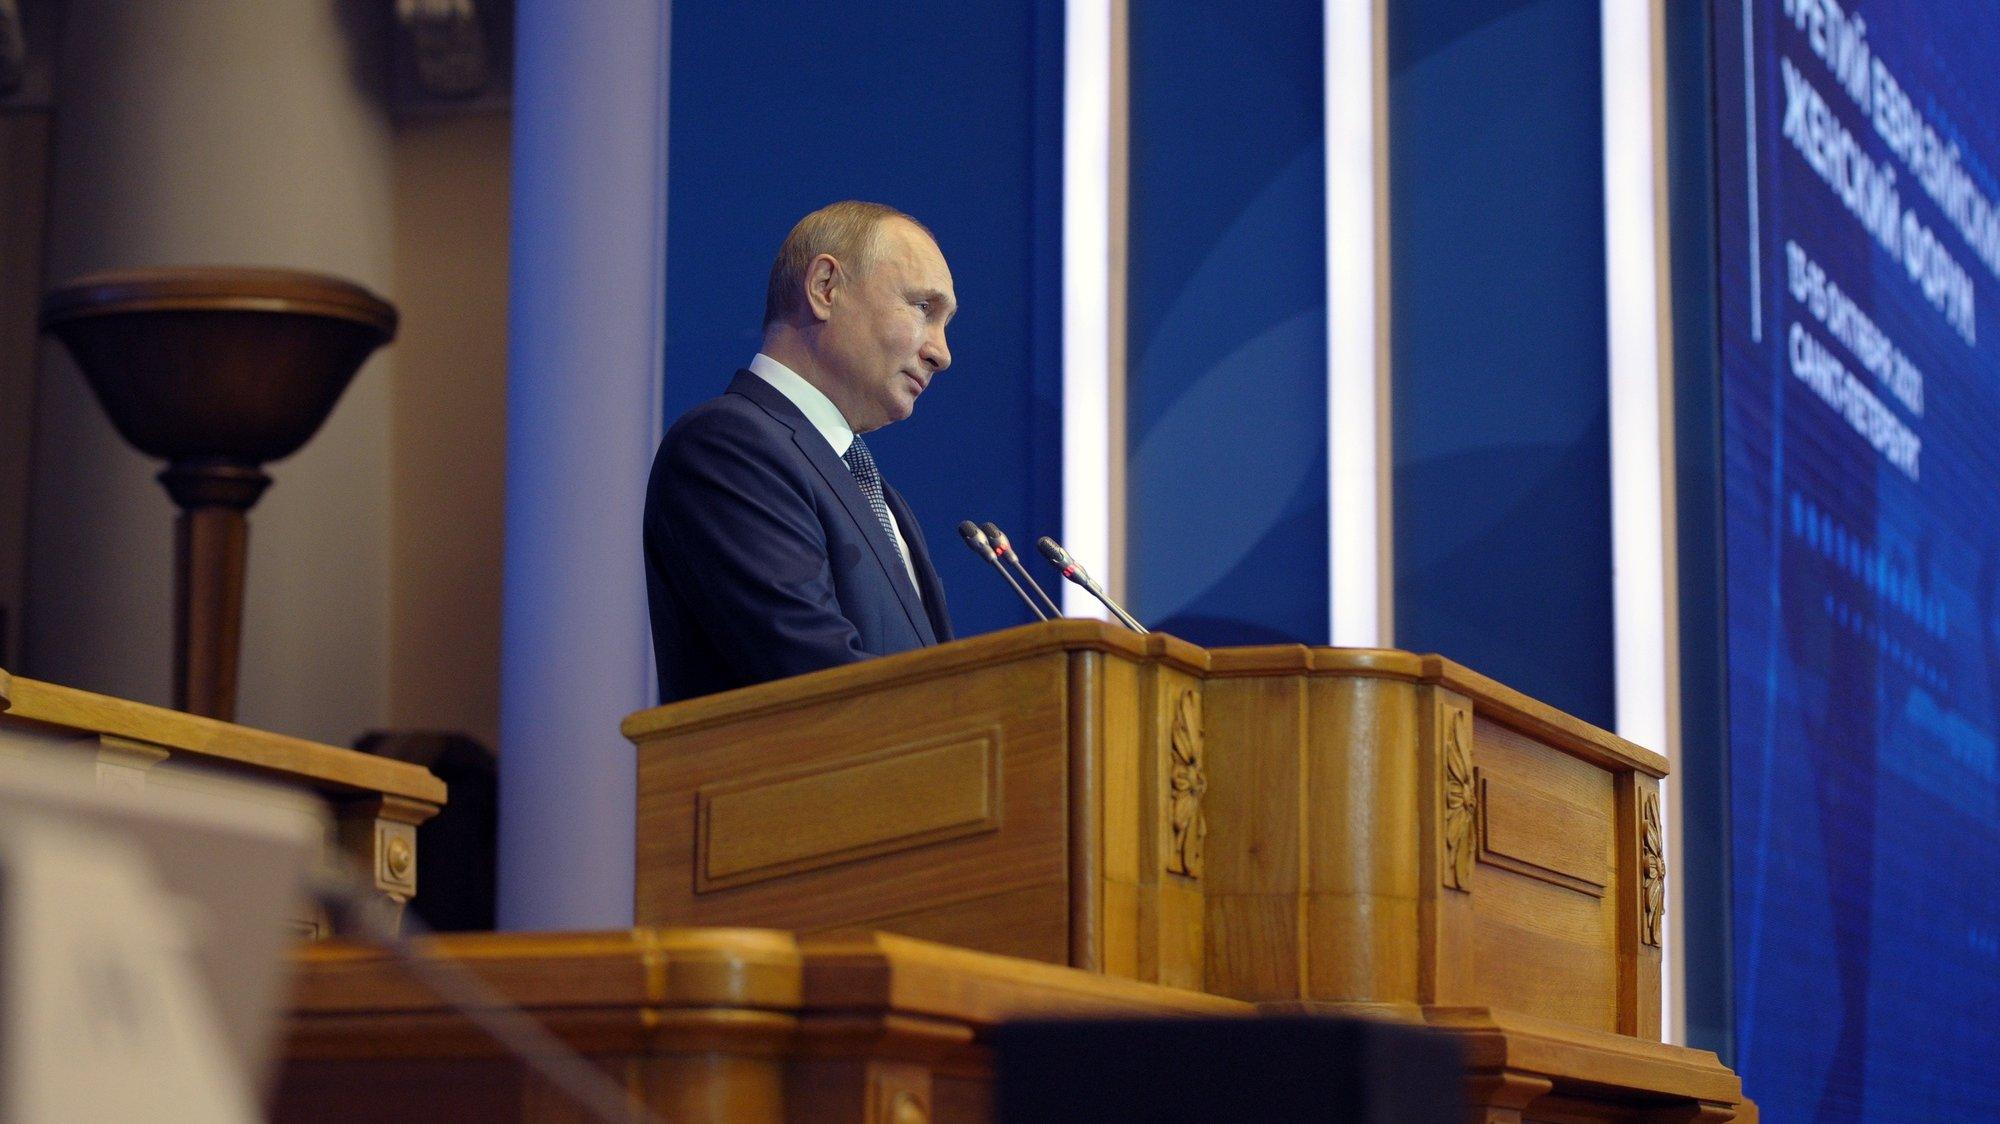 epa09523876 Russian President Vladimir Putin delivers a speech during the Third Eurasian Women's Forum held at the Tauride Palace, in St. Petersburg, Russia, 14 October 2021.  EPA/MIKHAEL KLIMENTYEV / SPUTNIK / KREMLIN POOL